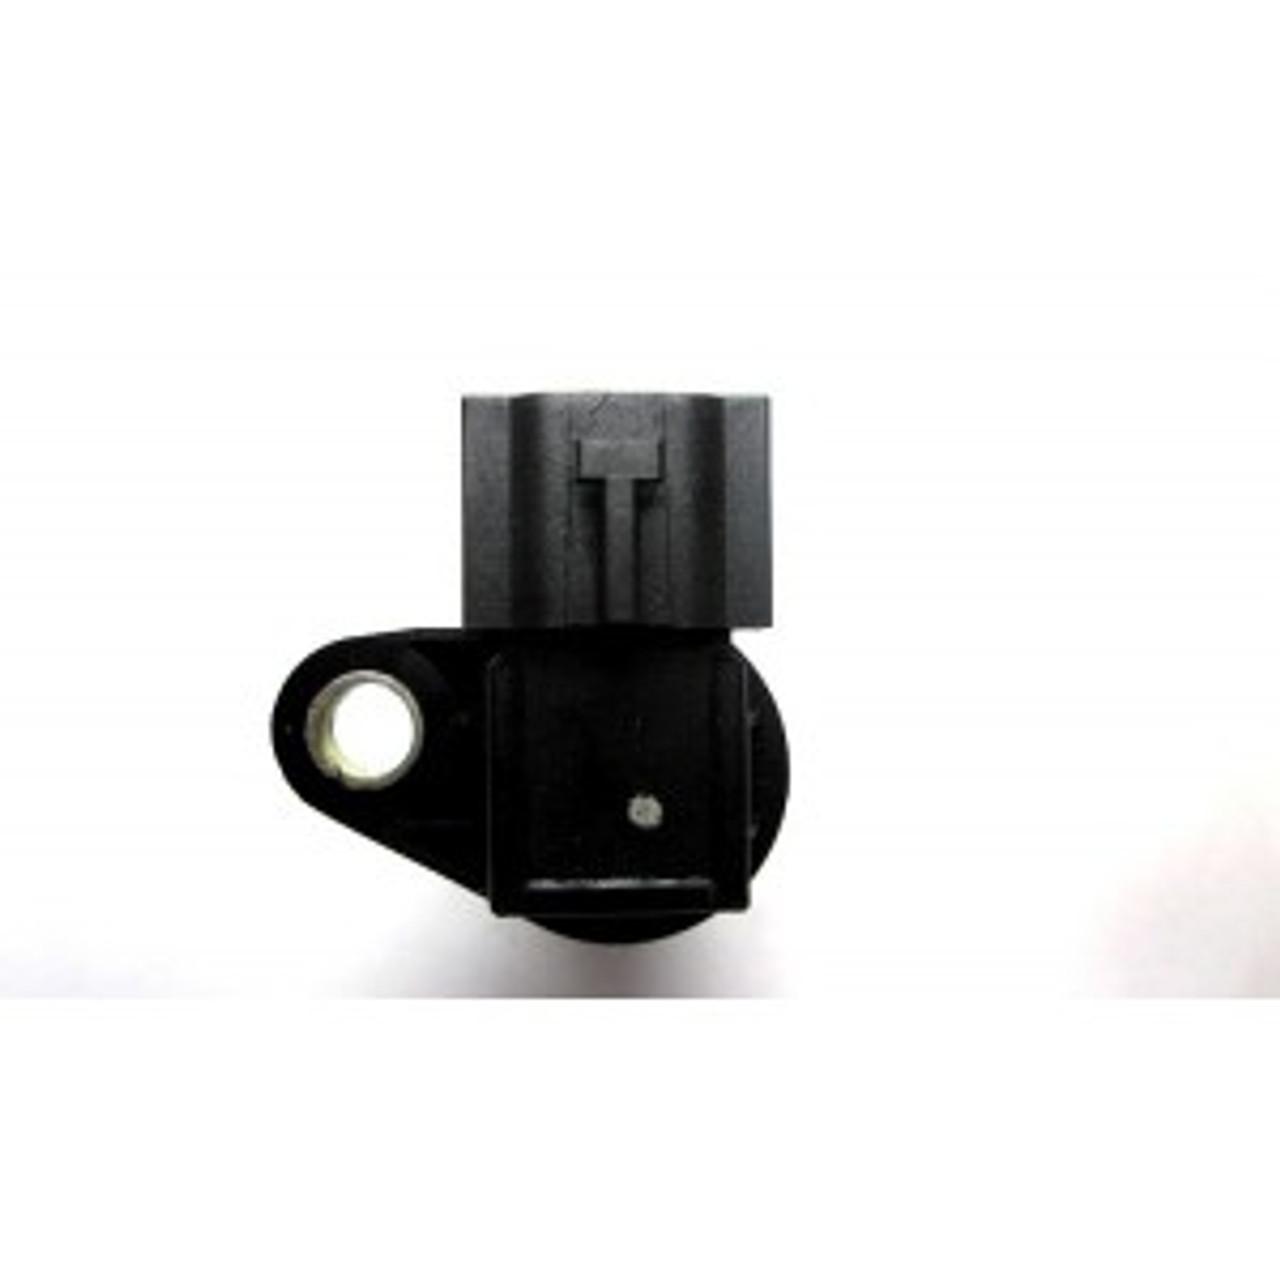 CVT Transmission Speed Sensor.